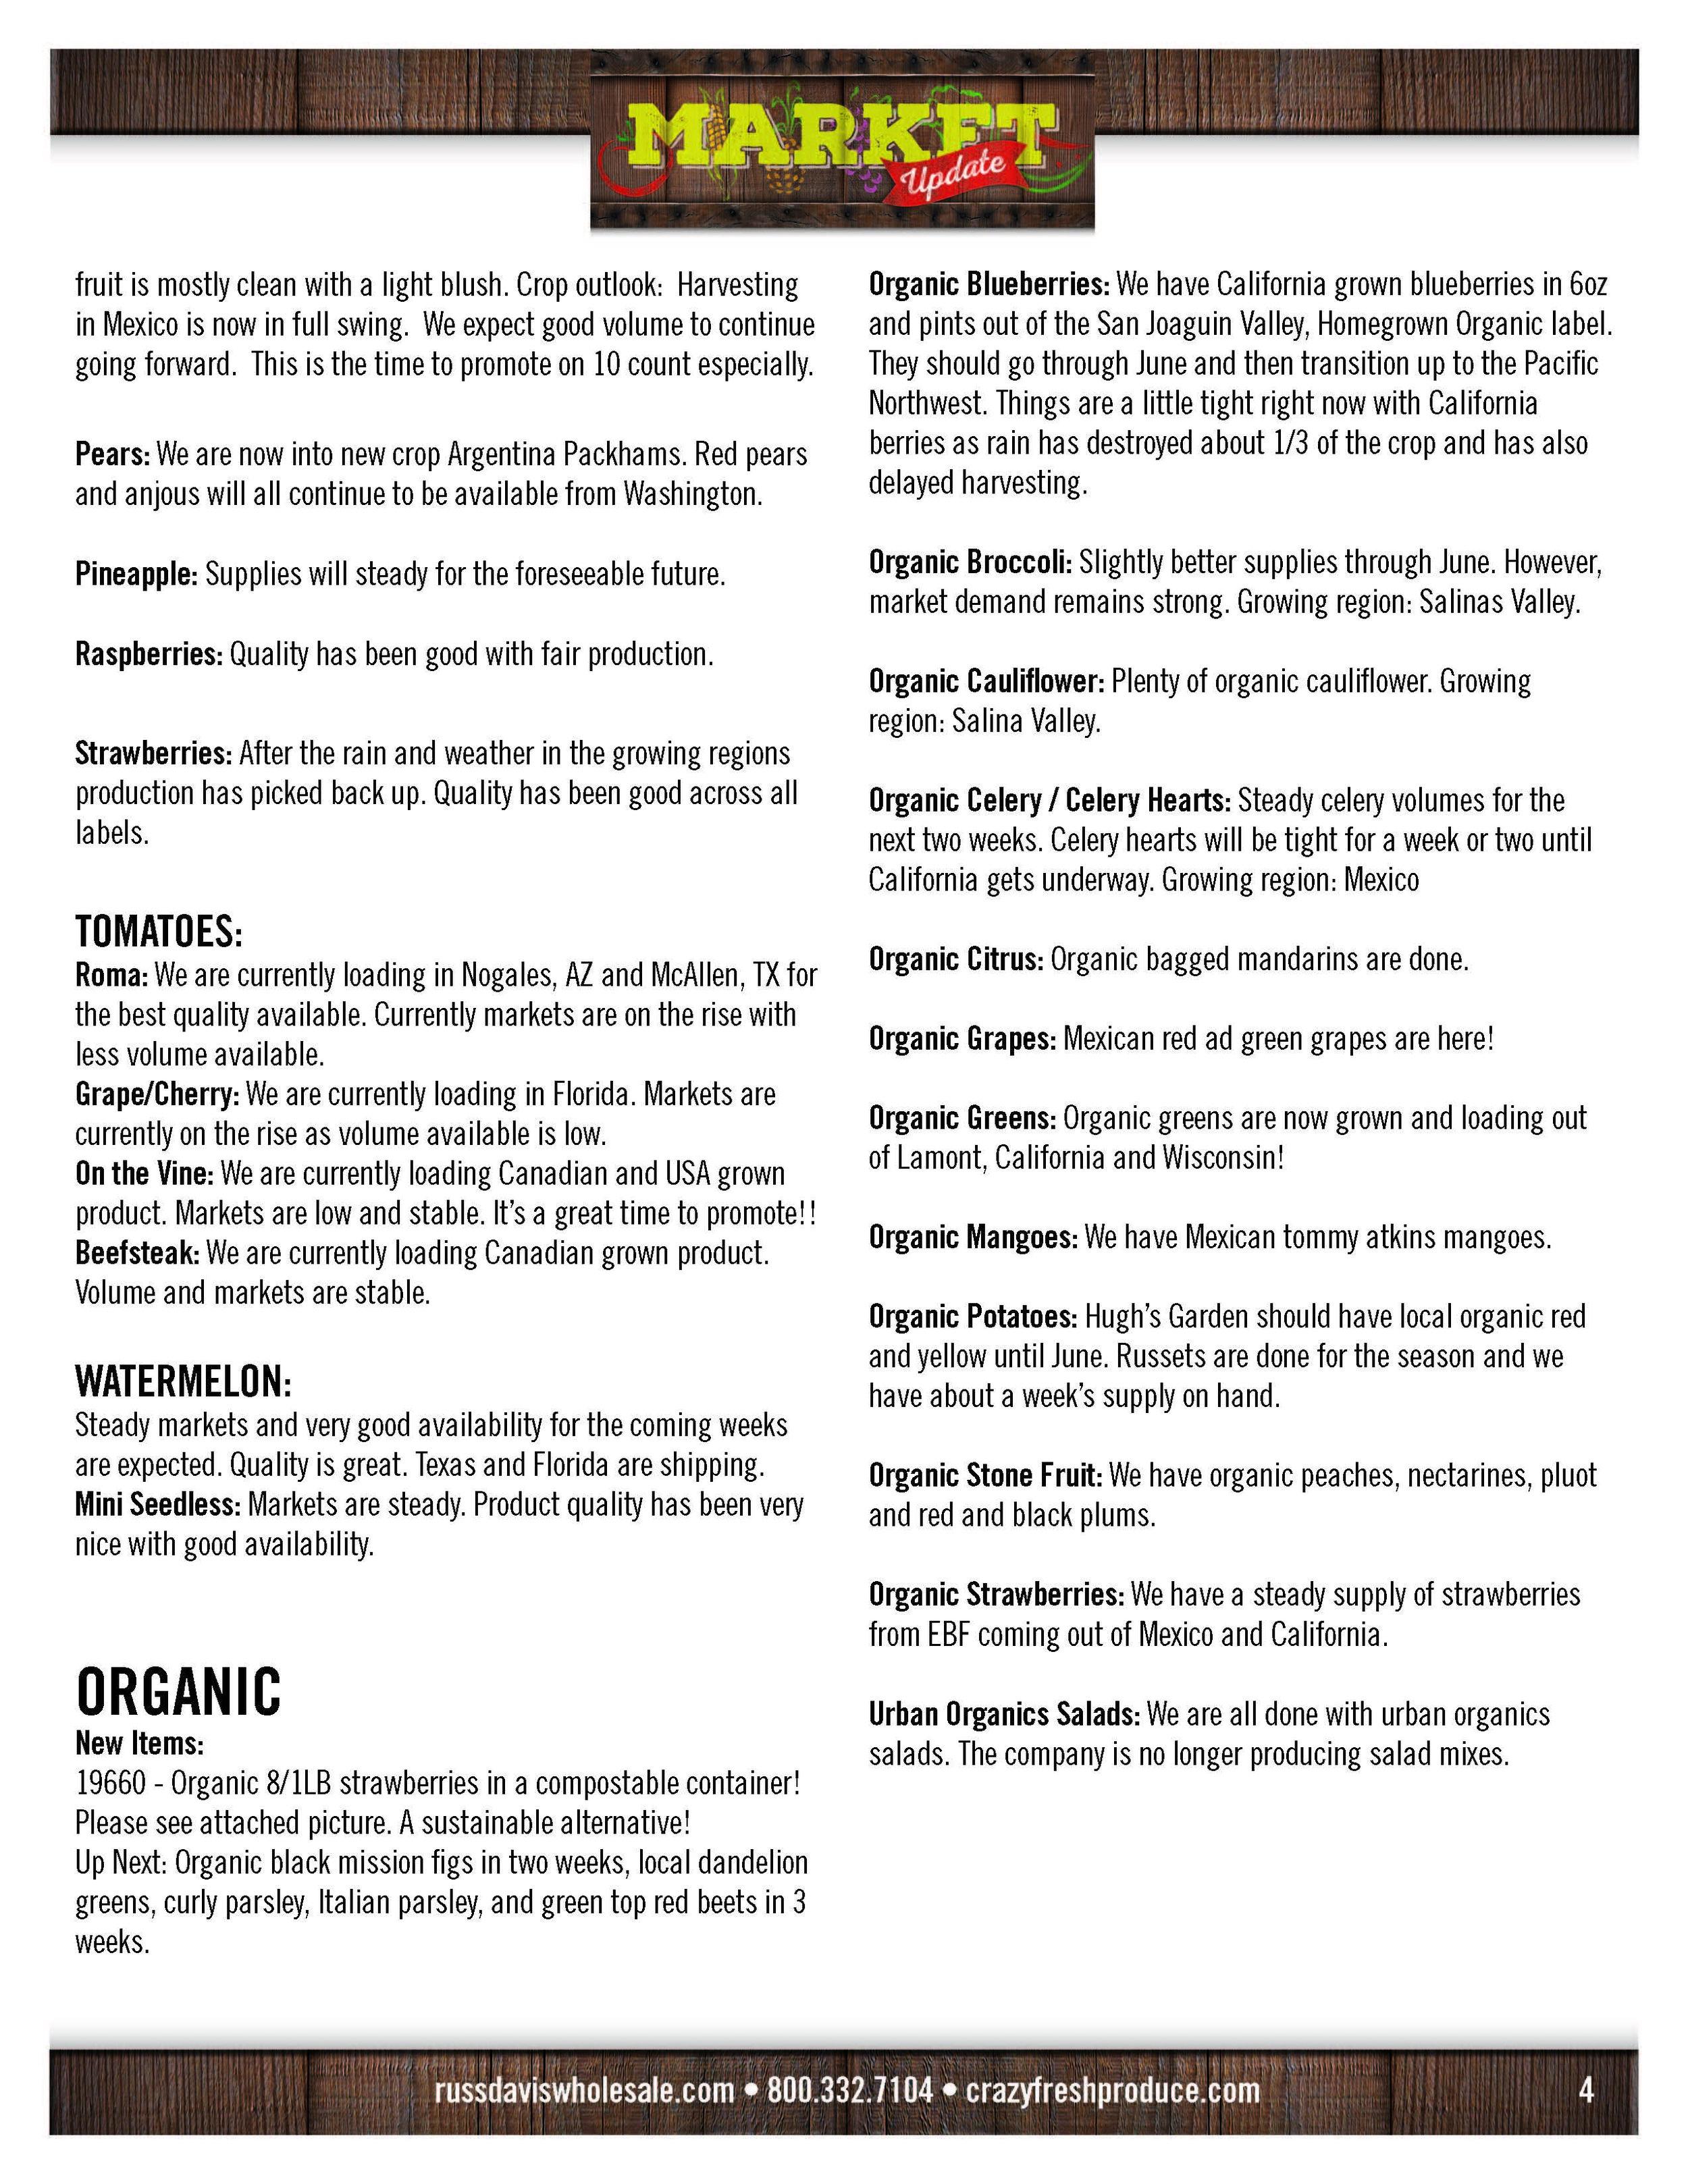 RDW_Market_Update_June6_19_Page_4.jpg